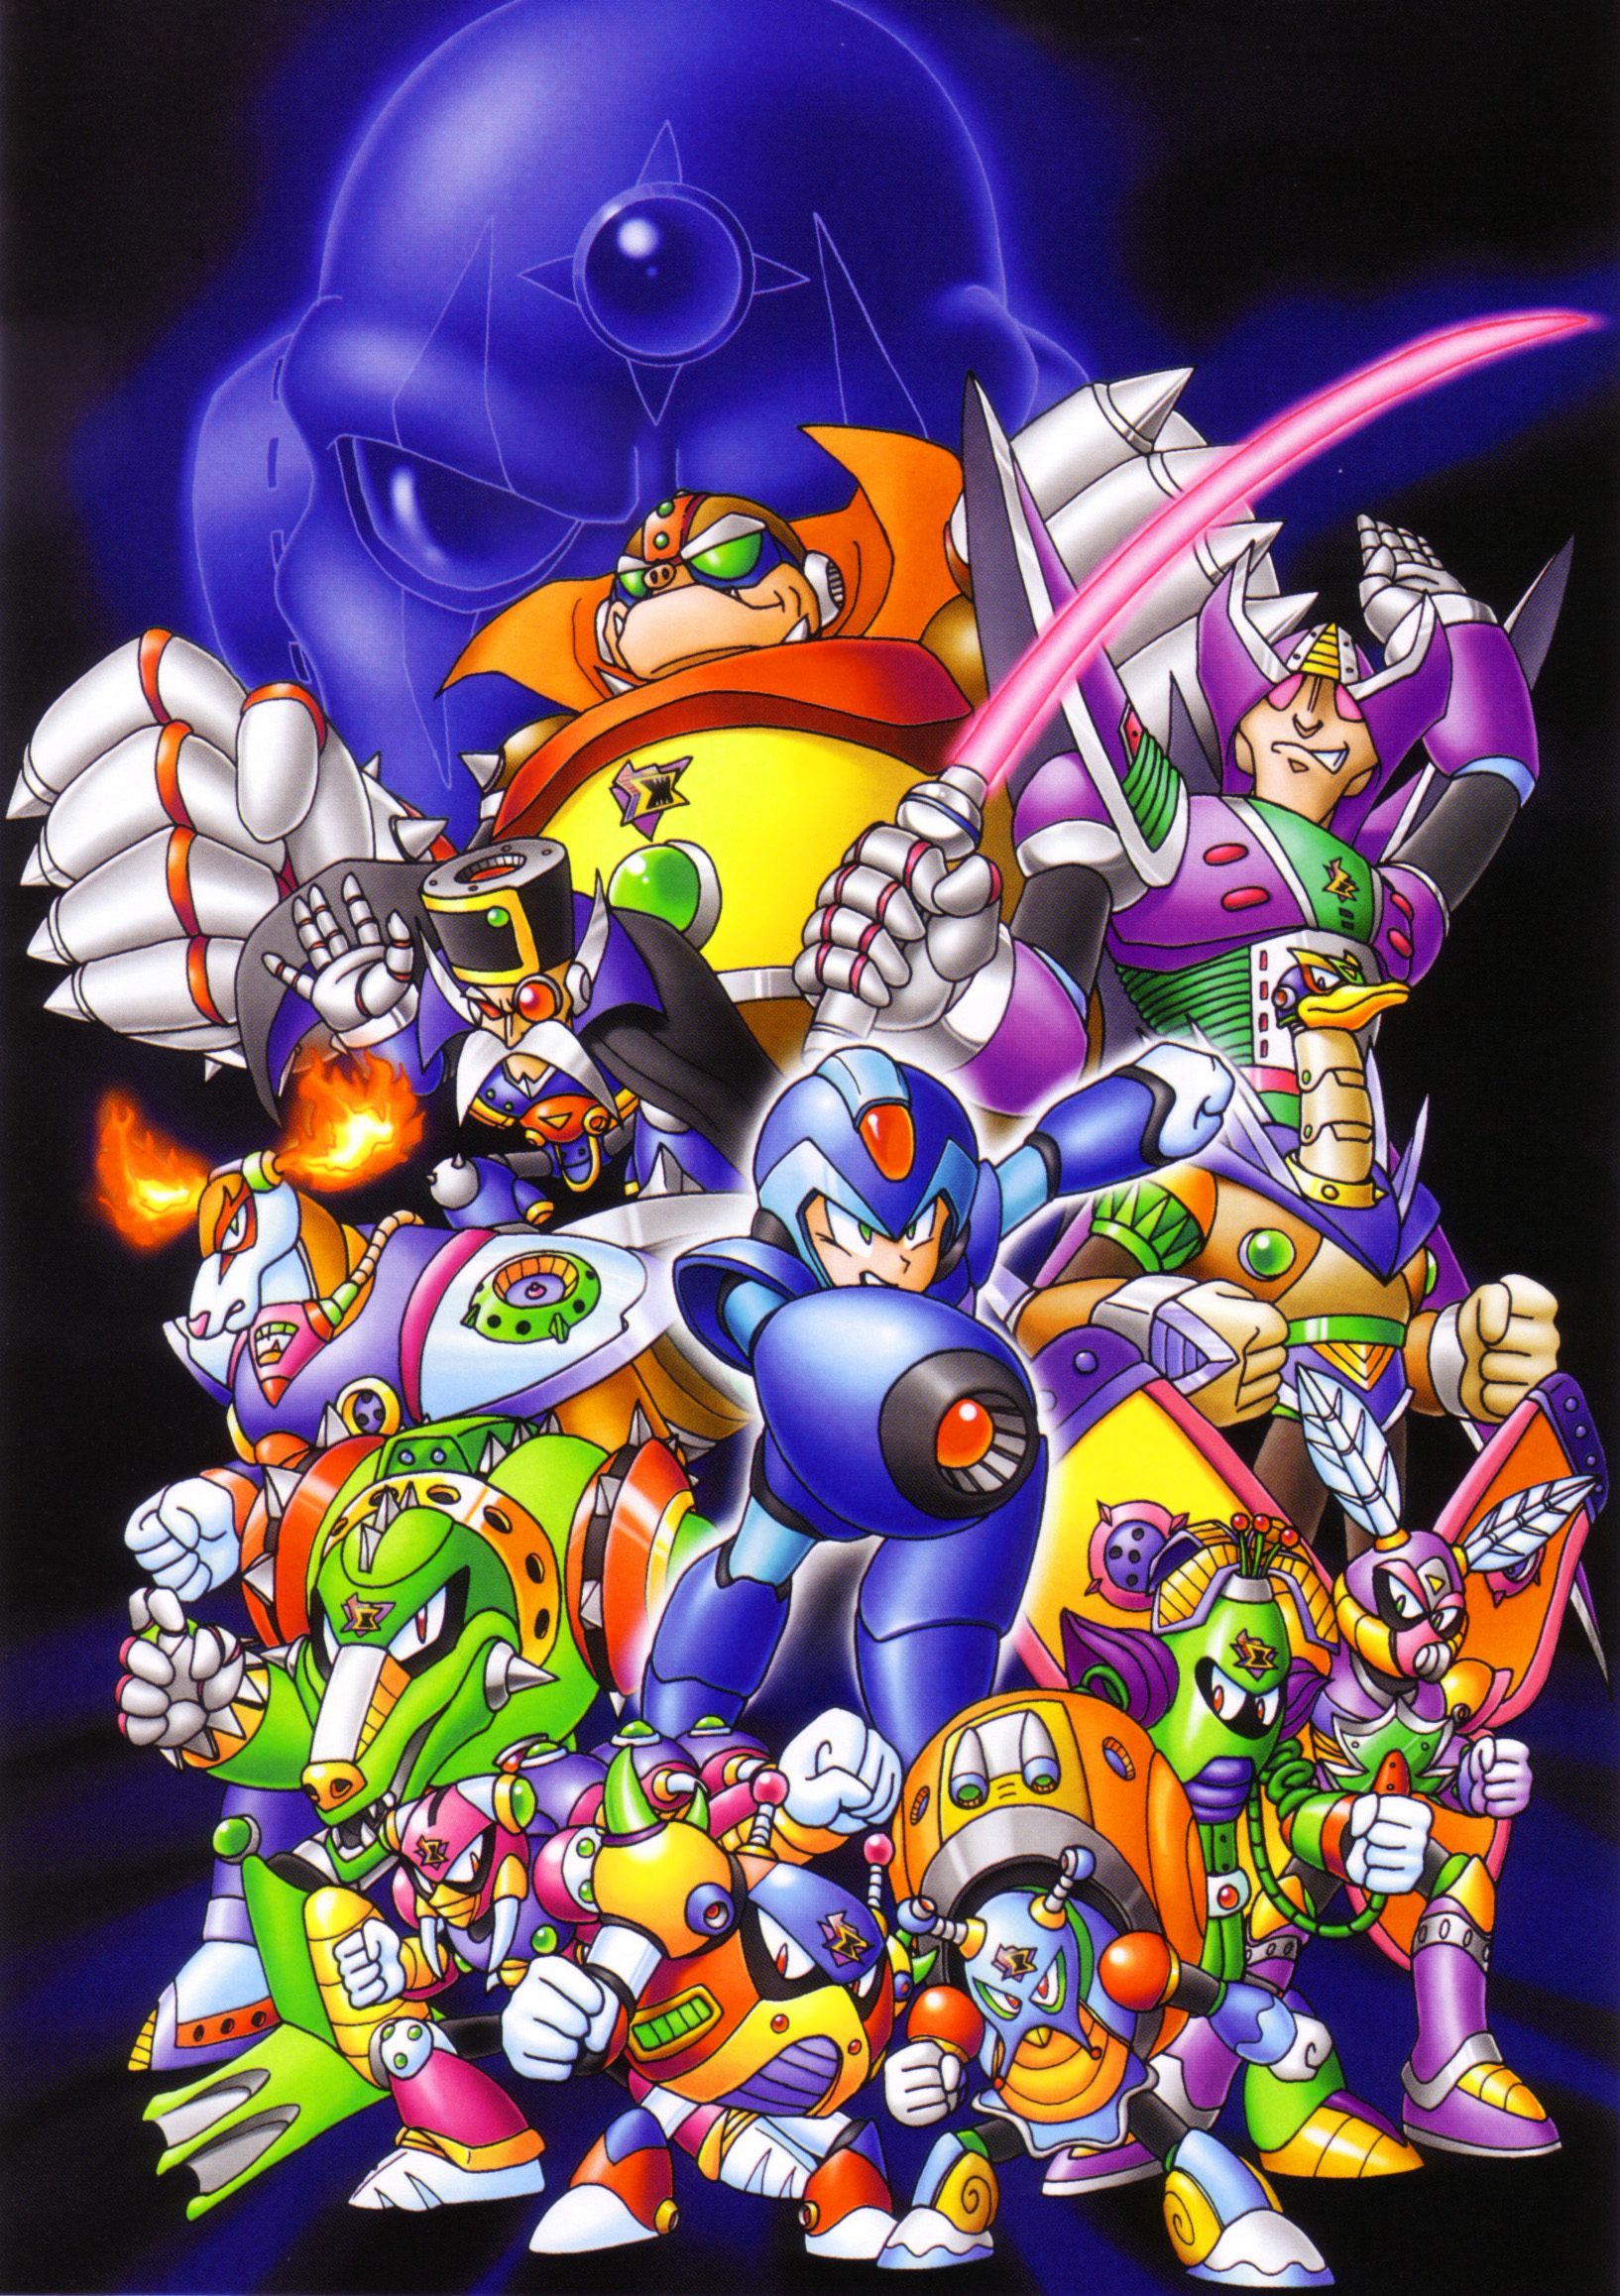 Mega man x2 mmkb fandom powered by wikia - Megaman wikia ...